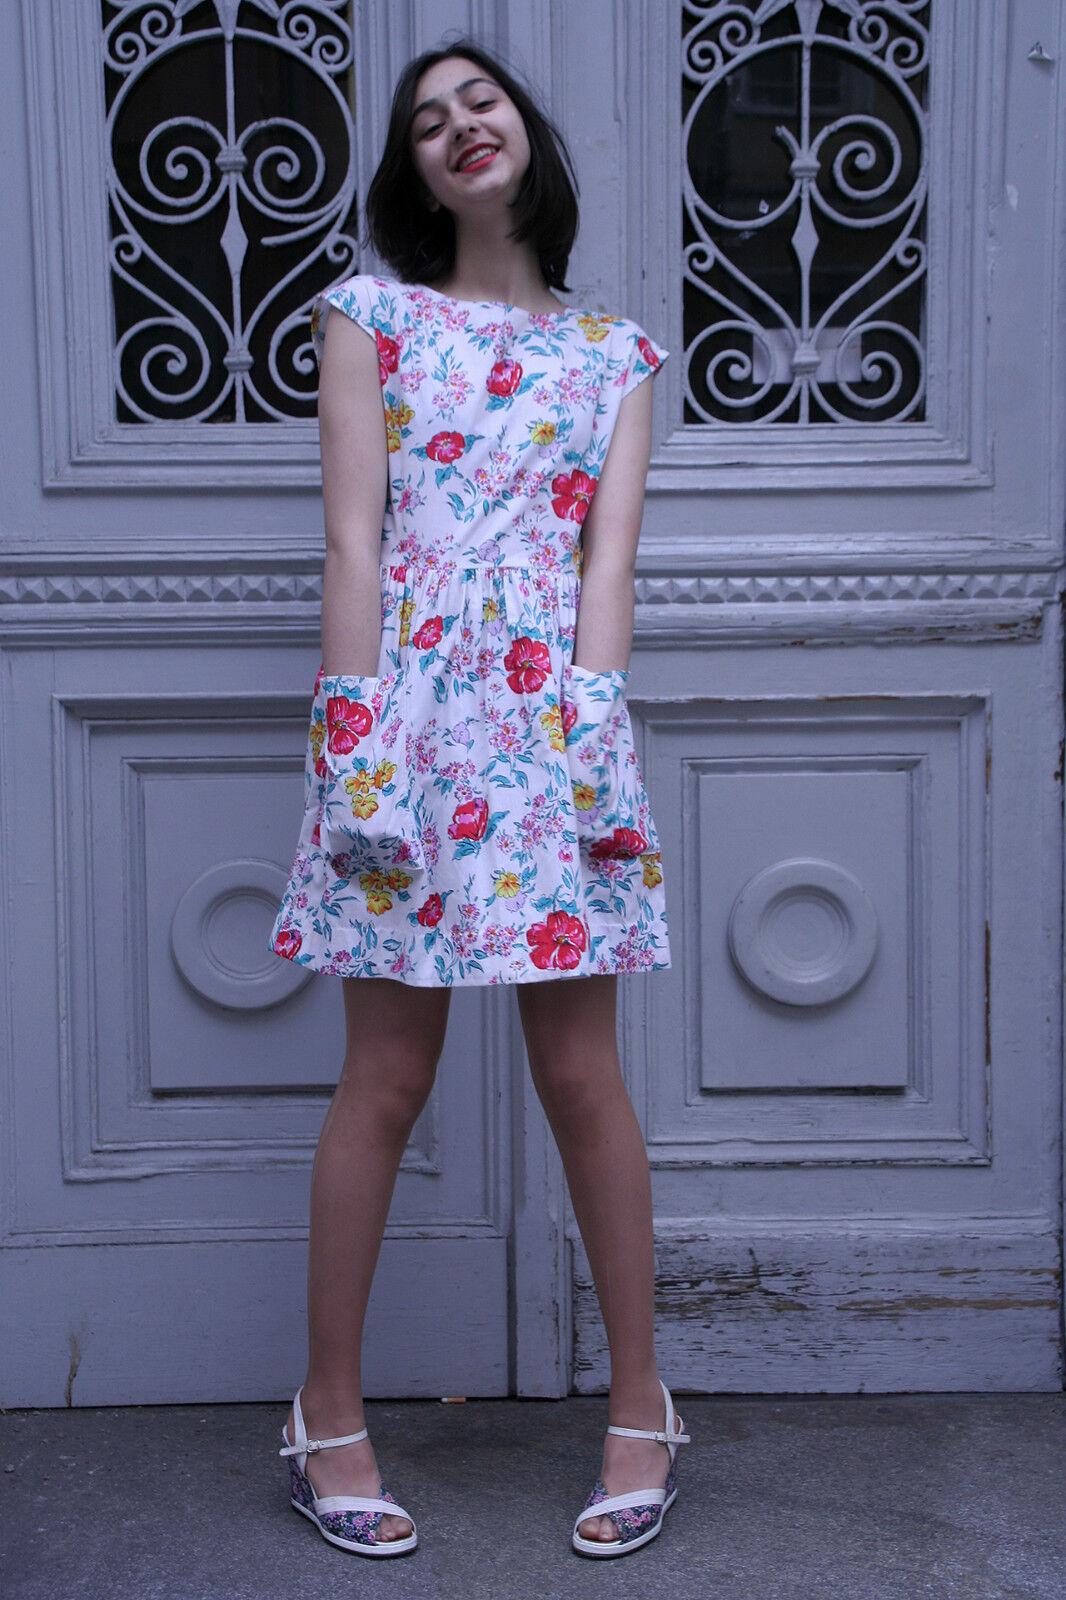 Damen Kleid Blaumenkleid 60er True VINTAGE 60's woman flower dress Damenmode